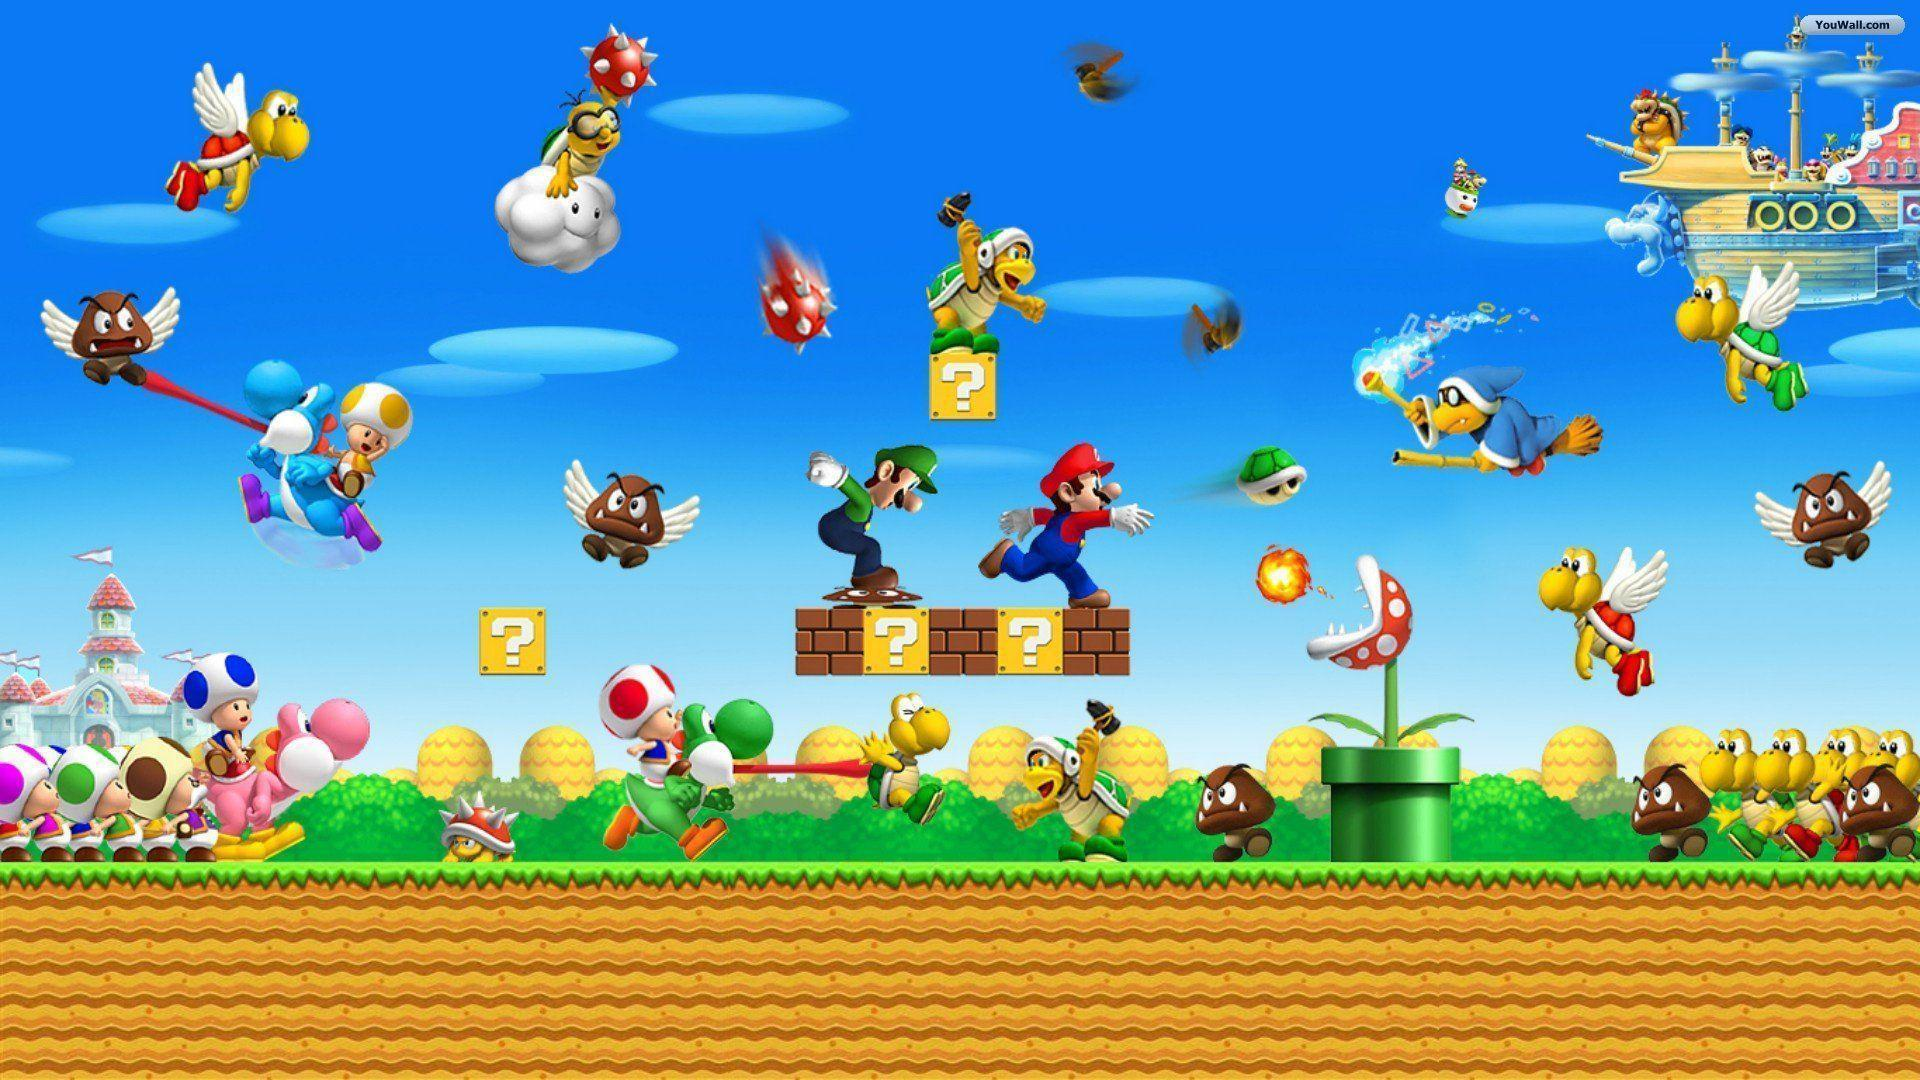 Mario Wallpapers Hd Wallpaper Cave